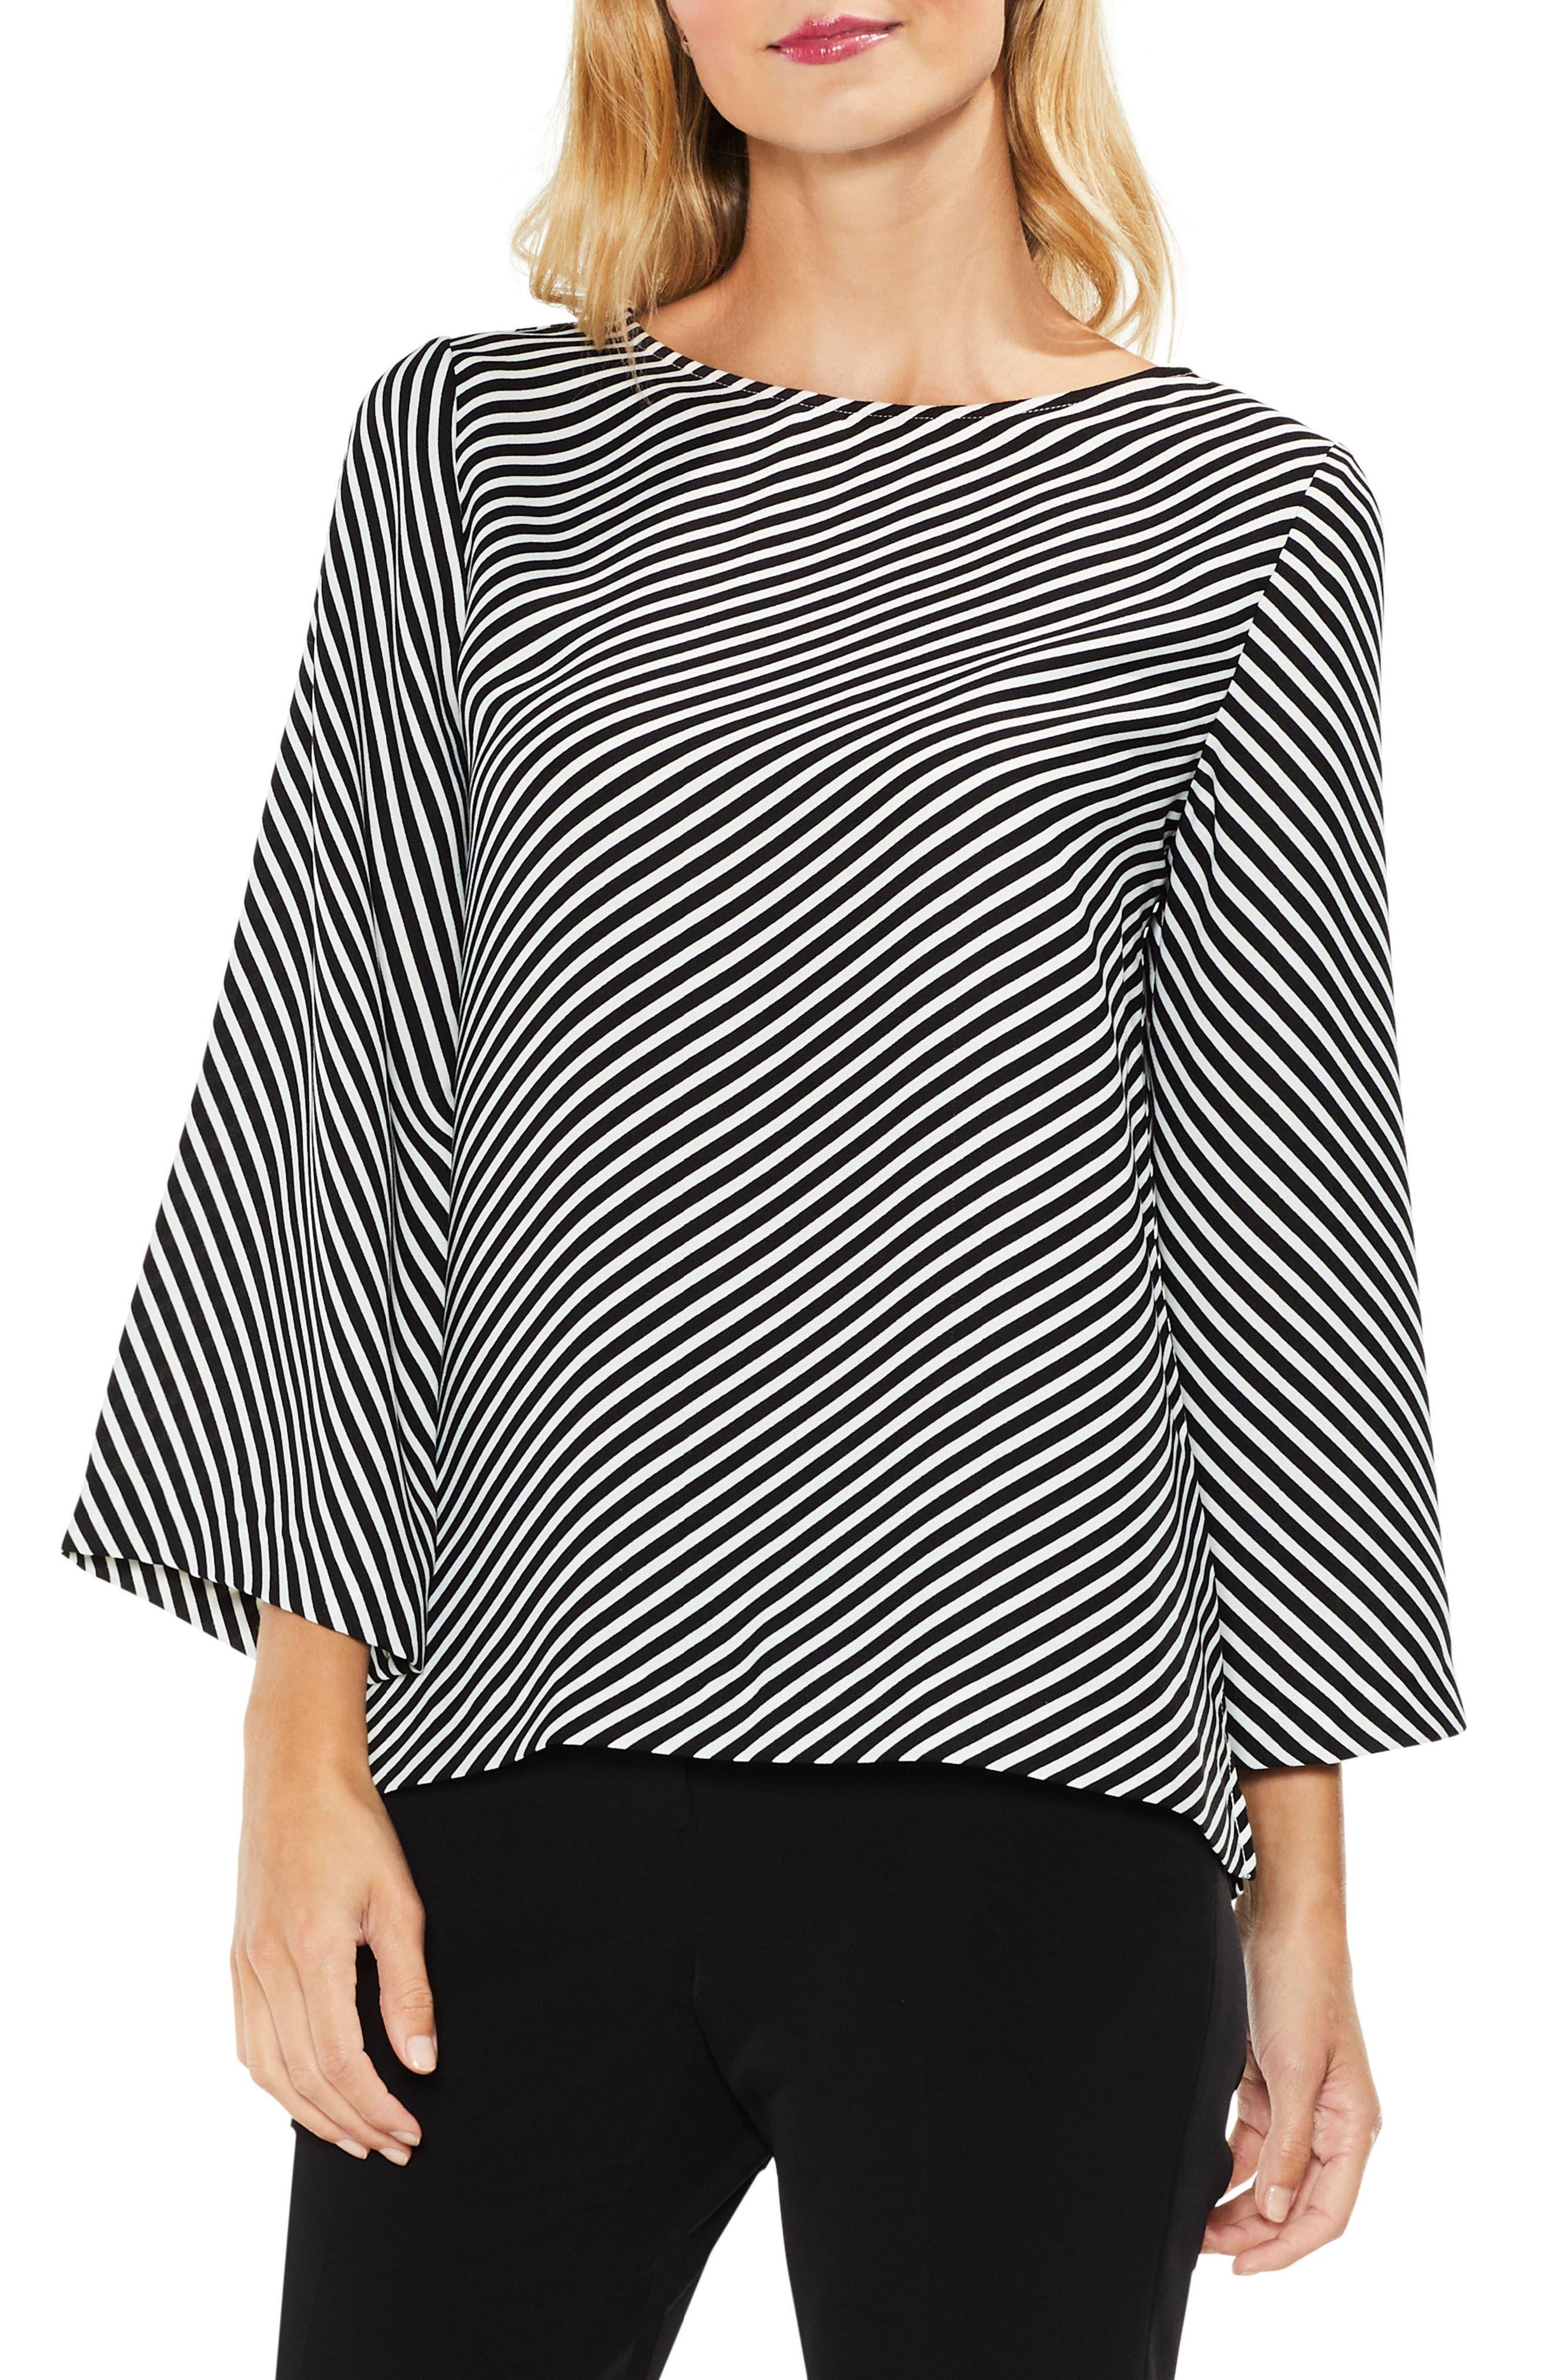 Main Image - Vince Camuto Diagonal Stripe Blouse